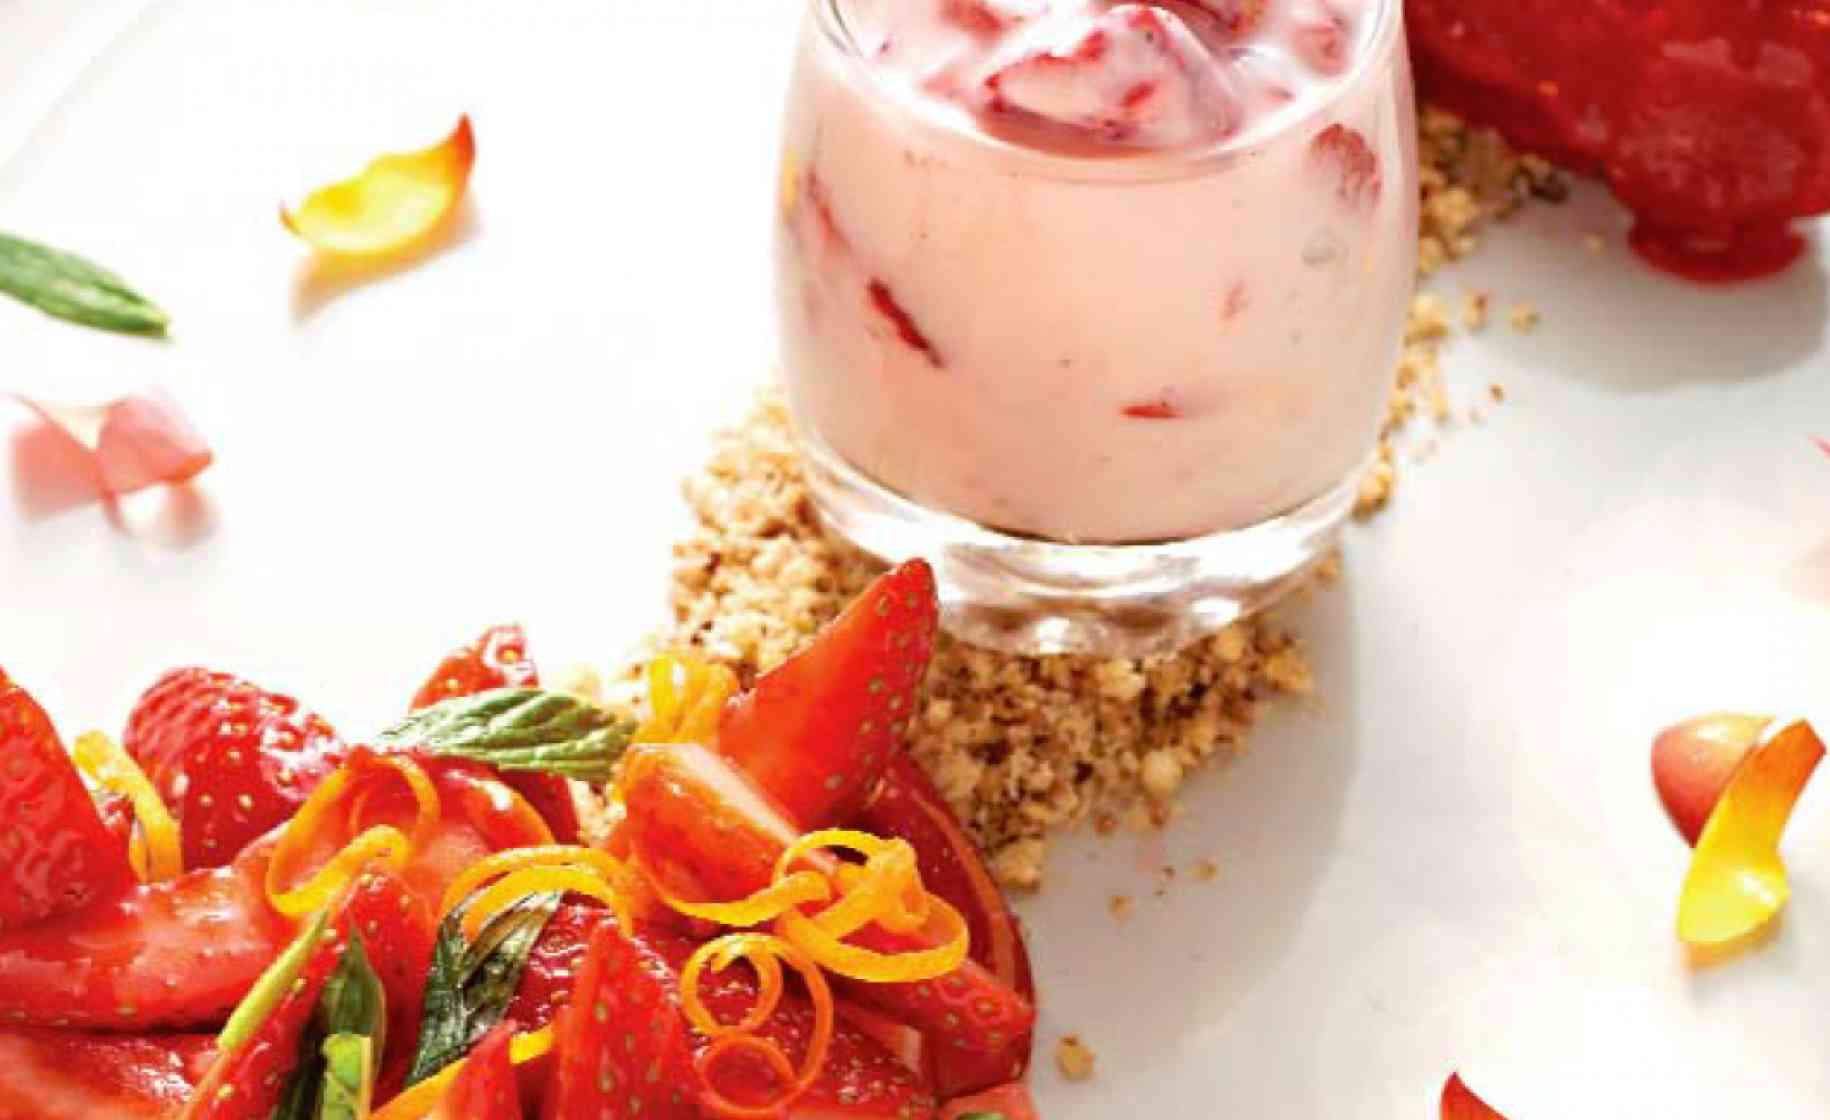 strawberry tasting plate